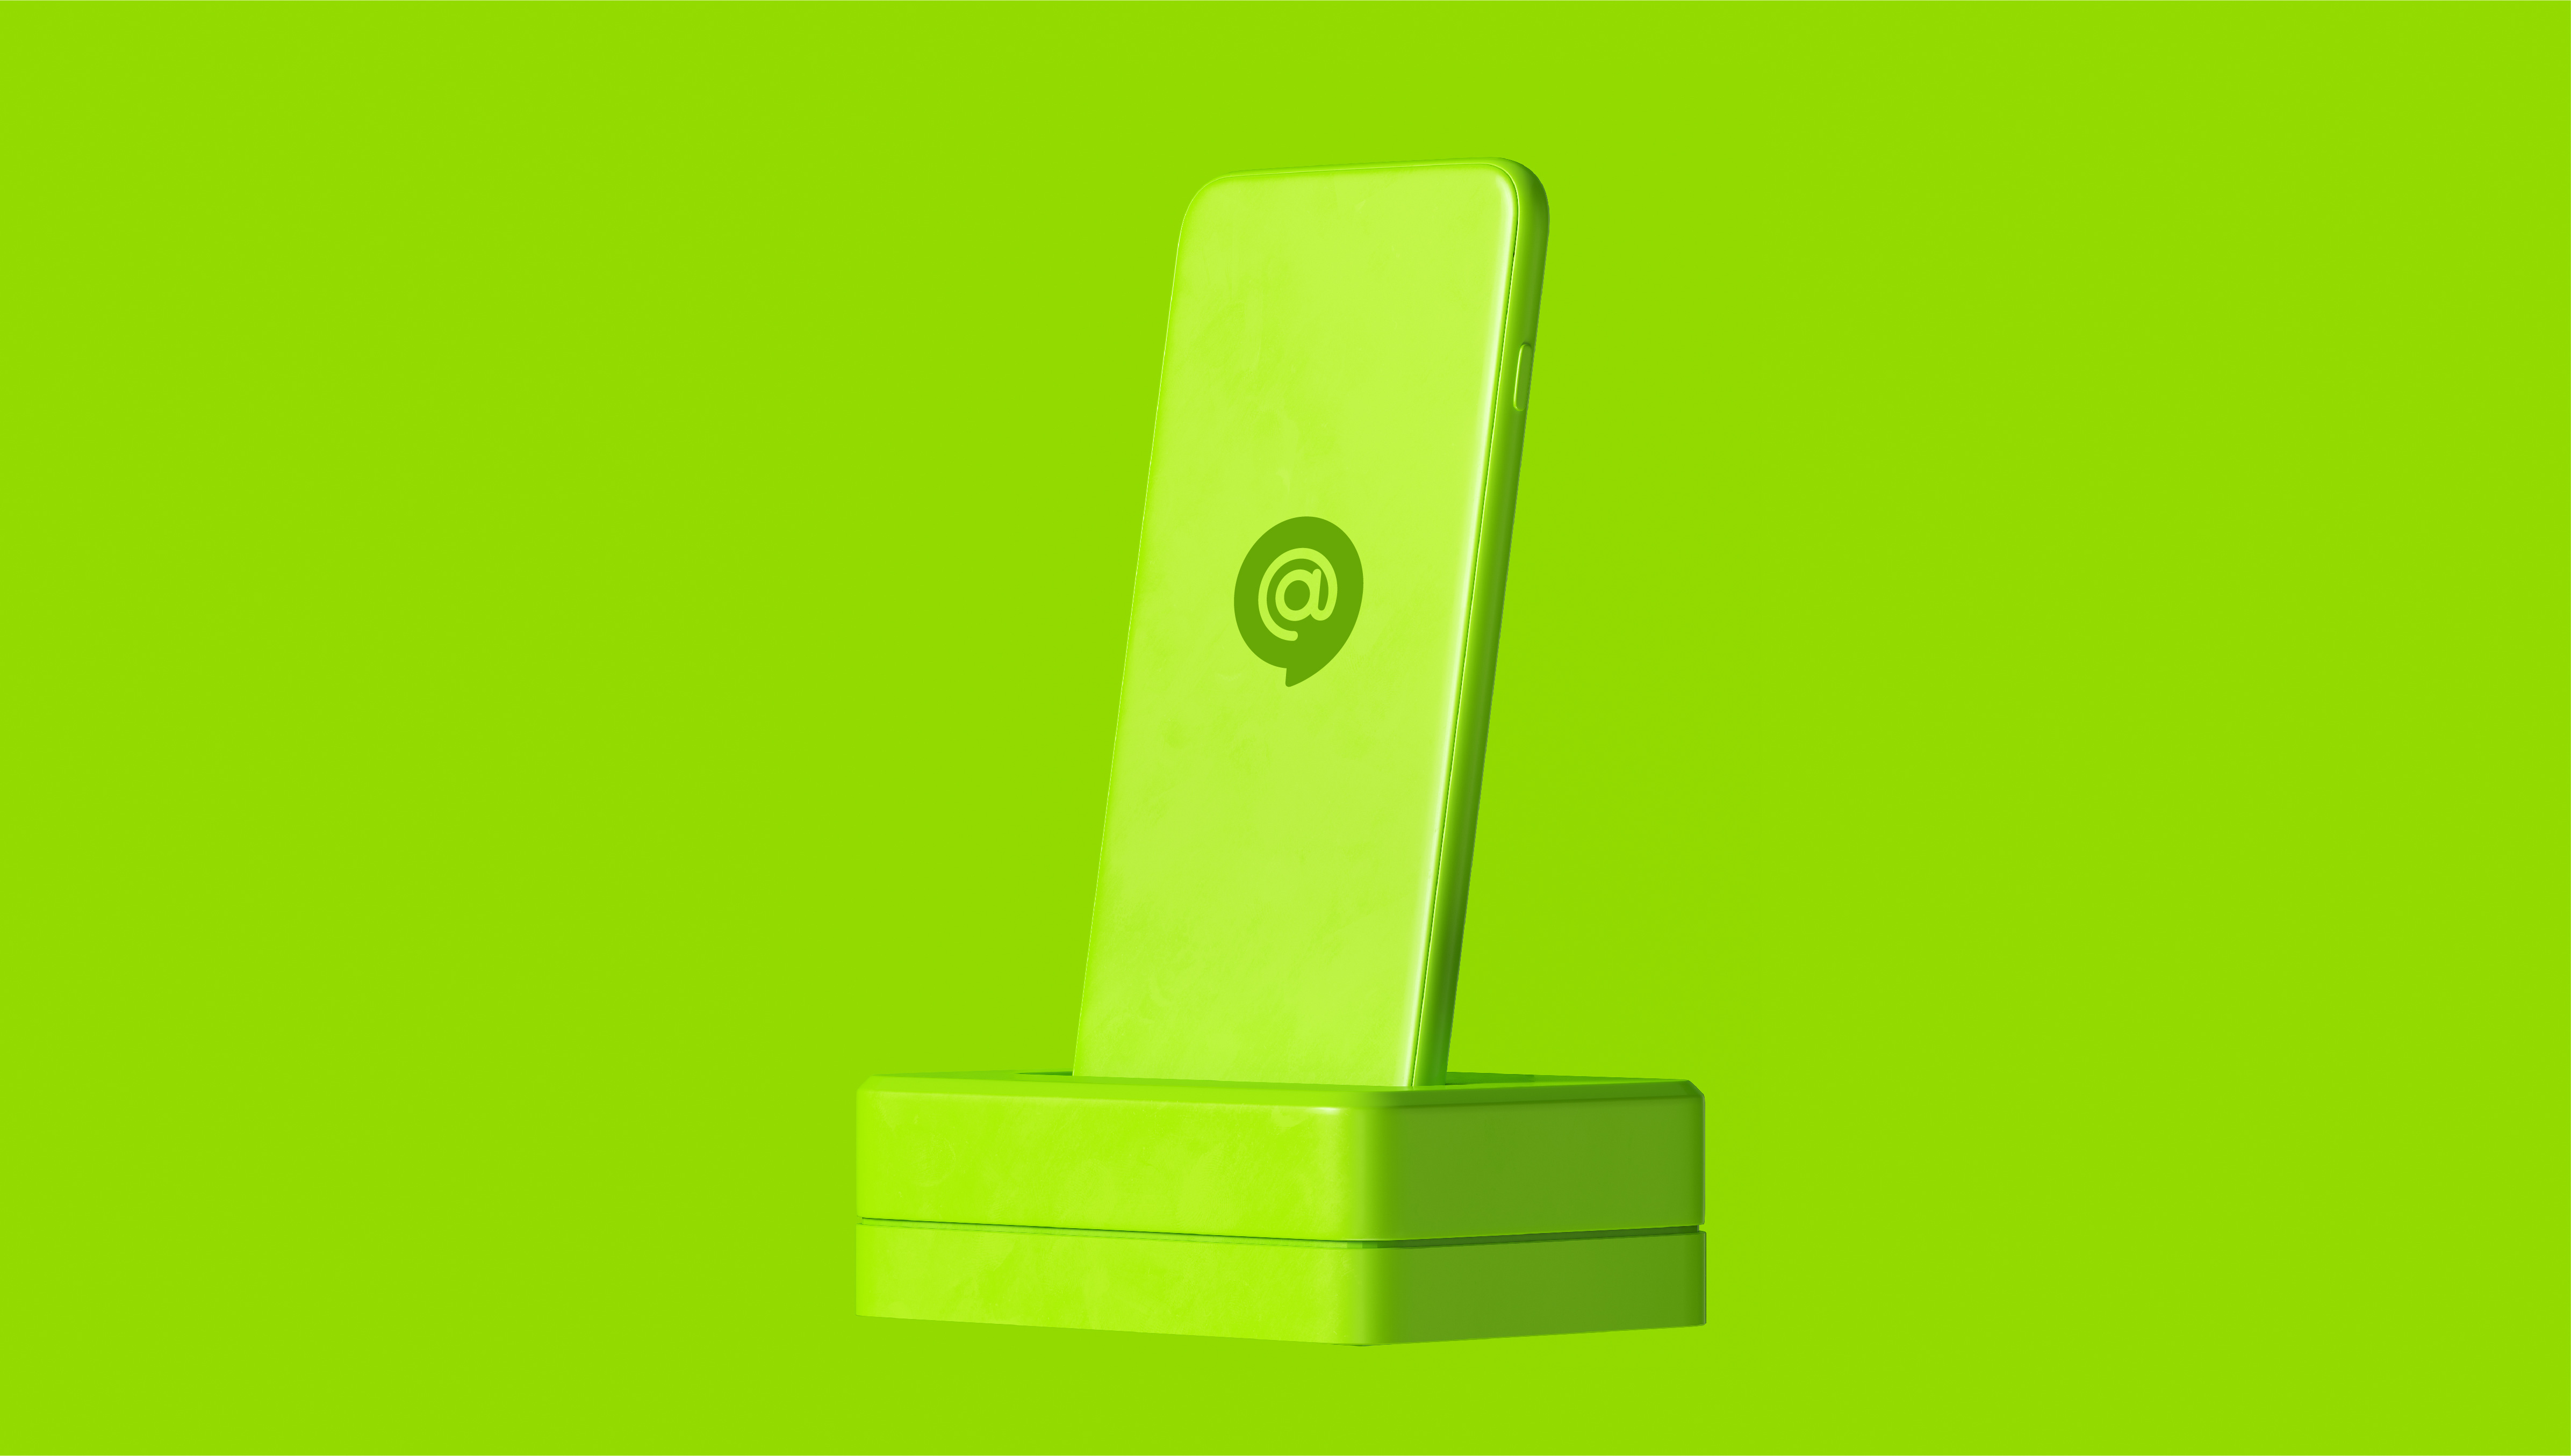 Post_Melhorias_GoogleChat-THUMB-BLOG